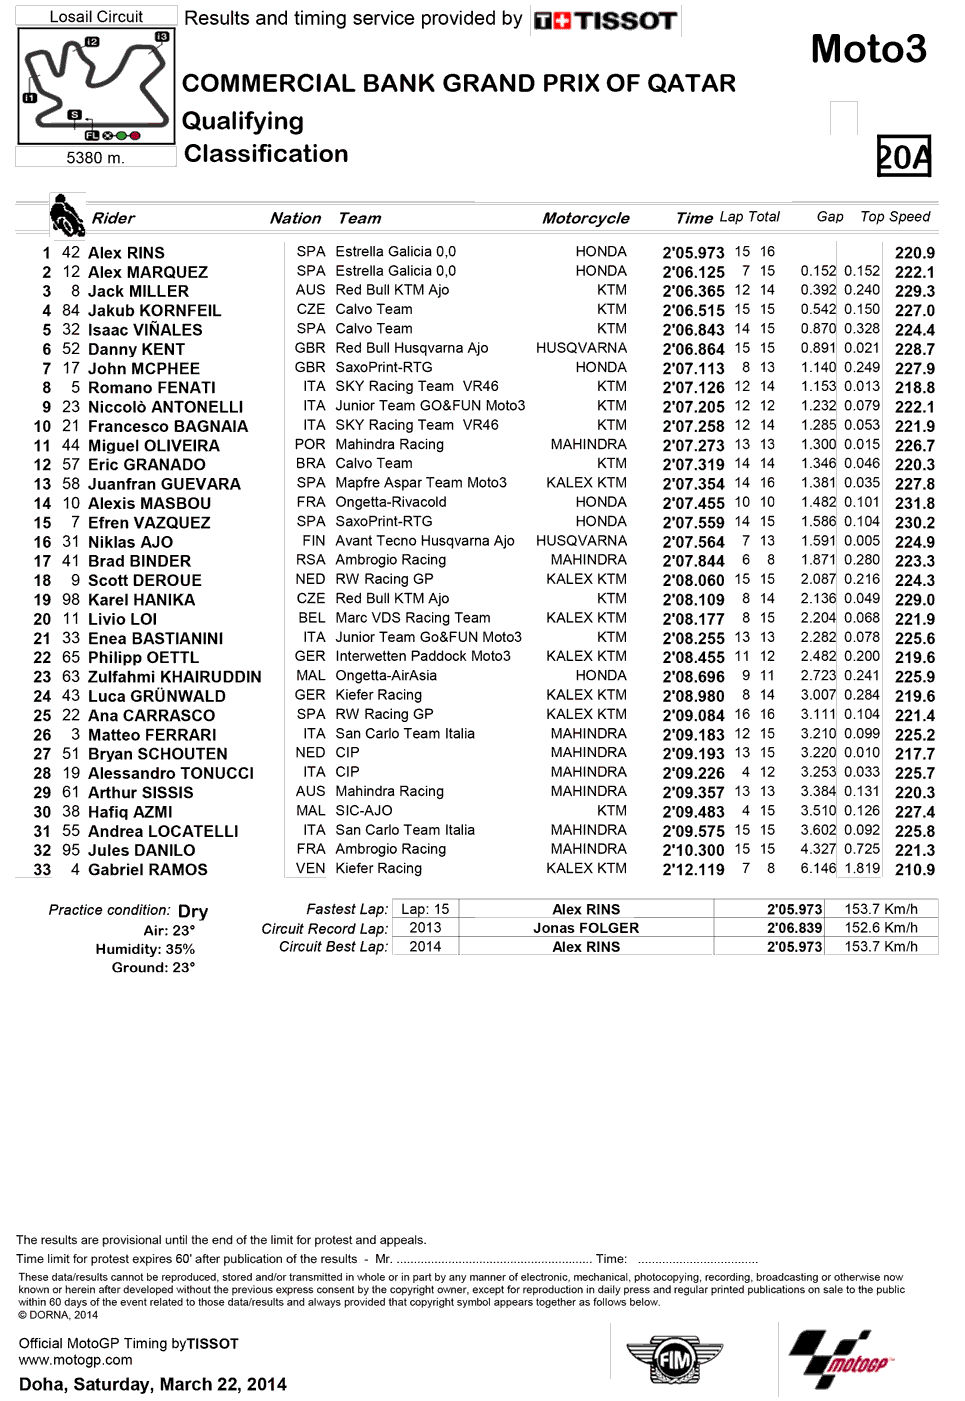 Результаты квалификации Moto3 Гран-При Катара 2014